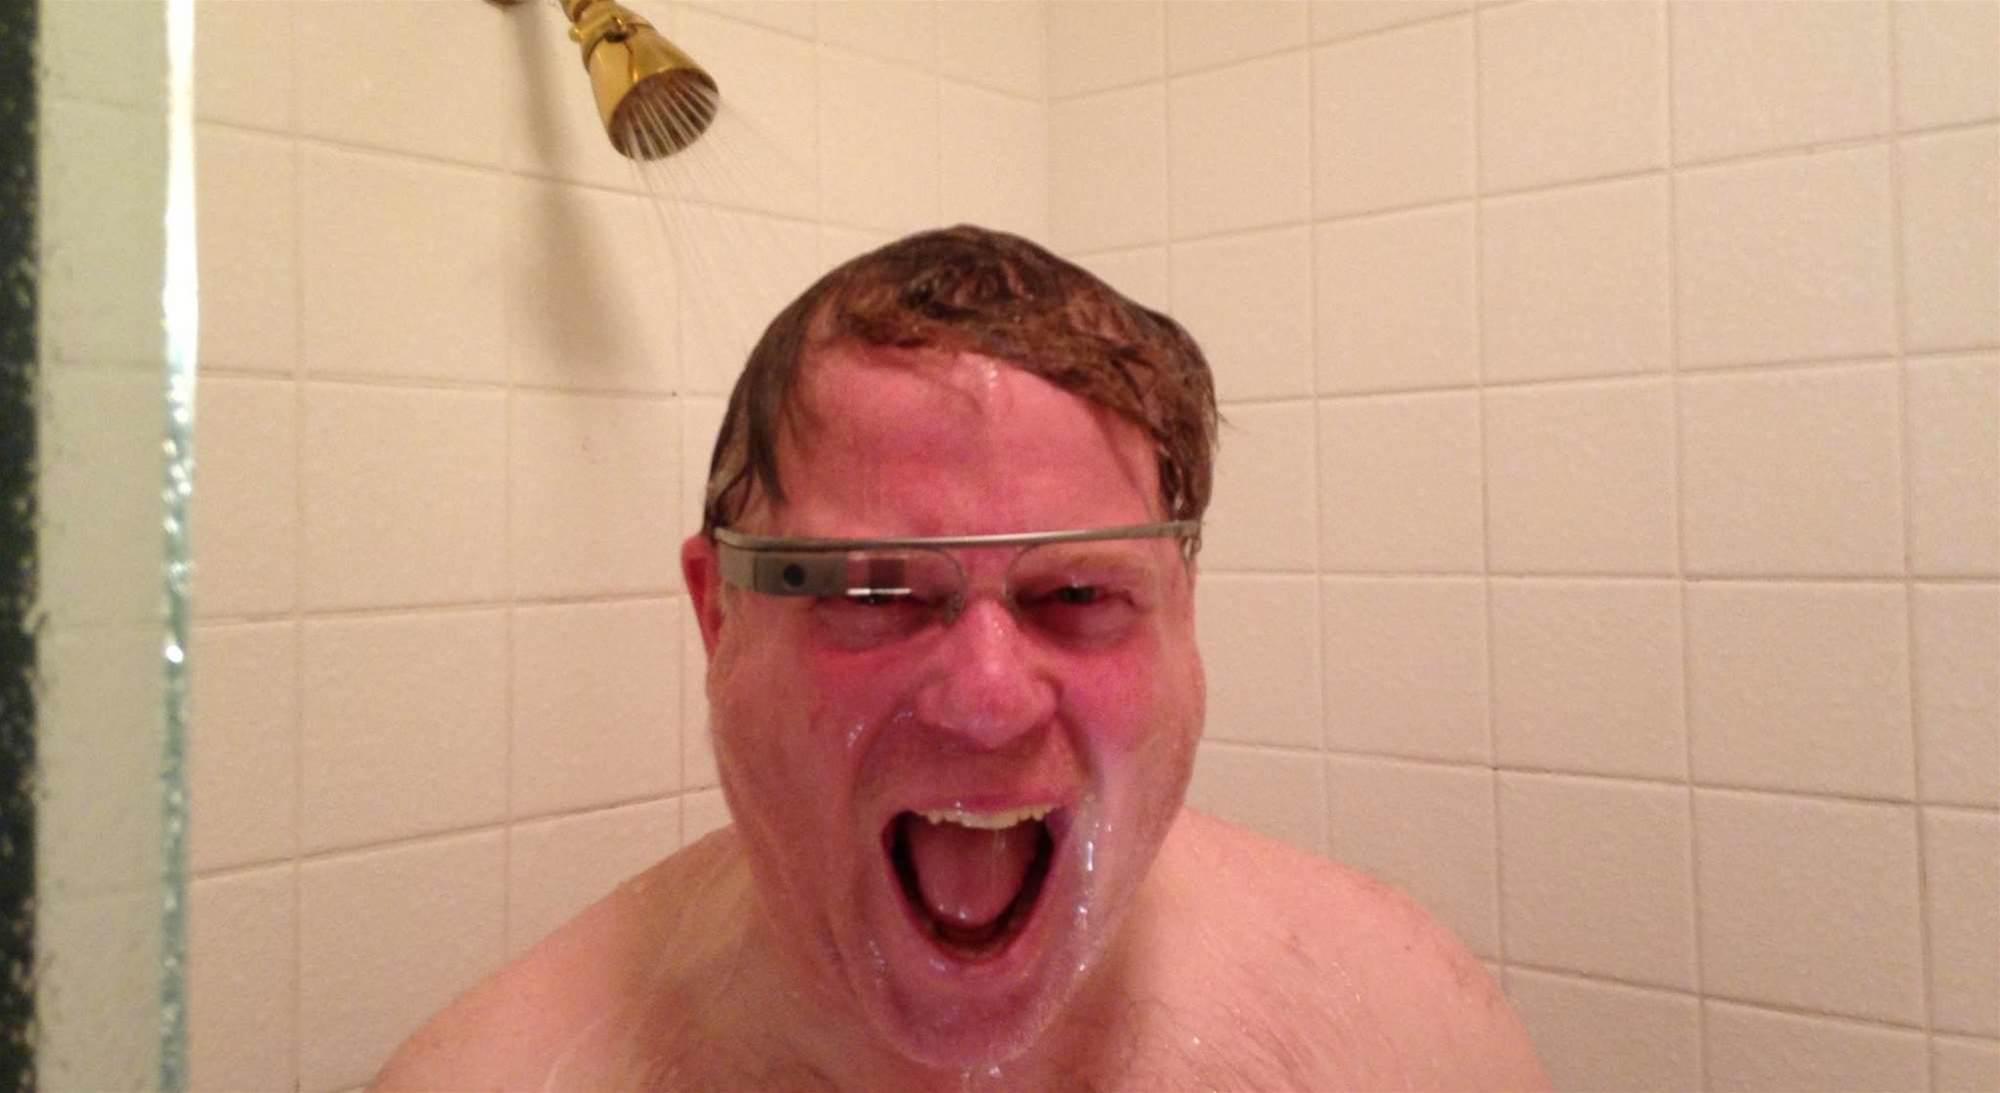 Google pulls Glass from market